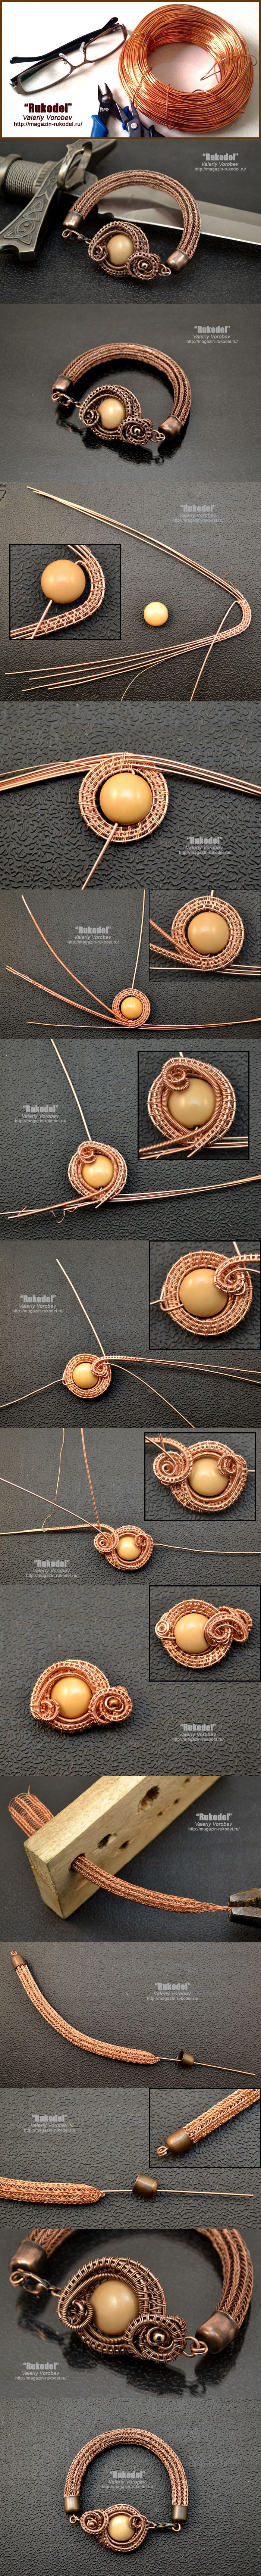 Браслет из проволоки. Wire Wrapped Bracelet Viking Knit. | Рукодел